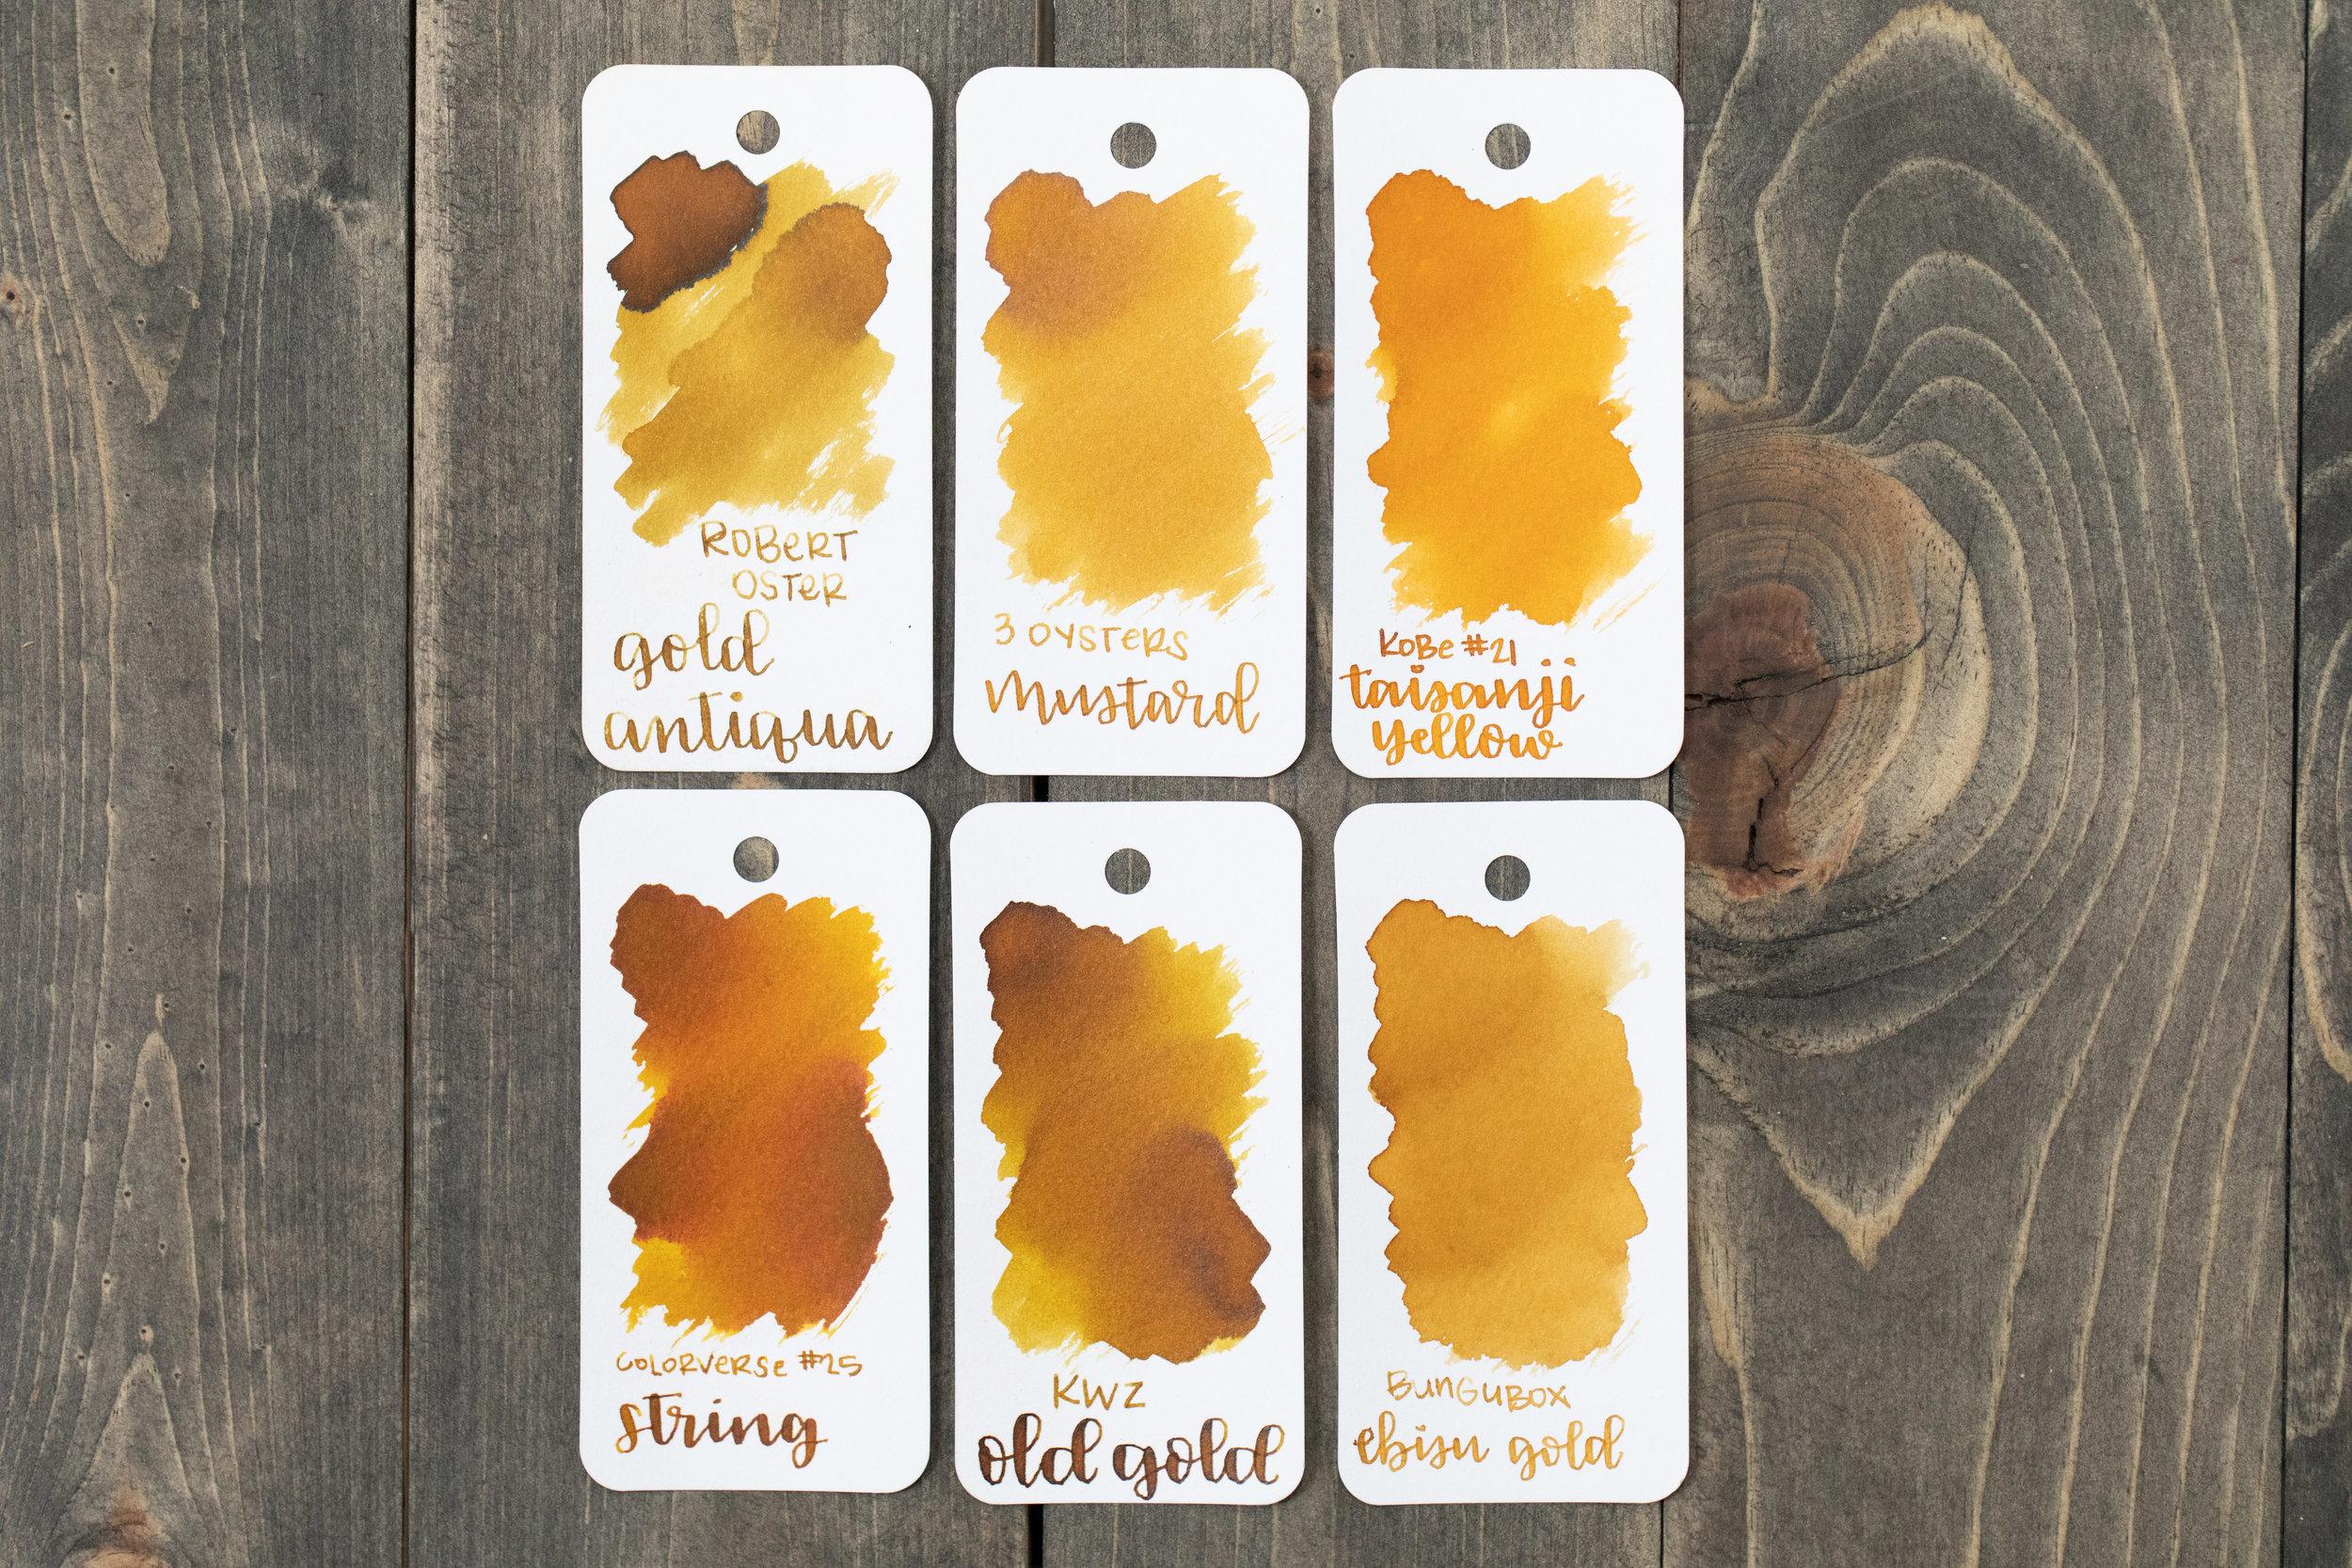 3o-mustard-w-1.jpg